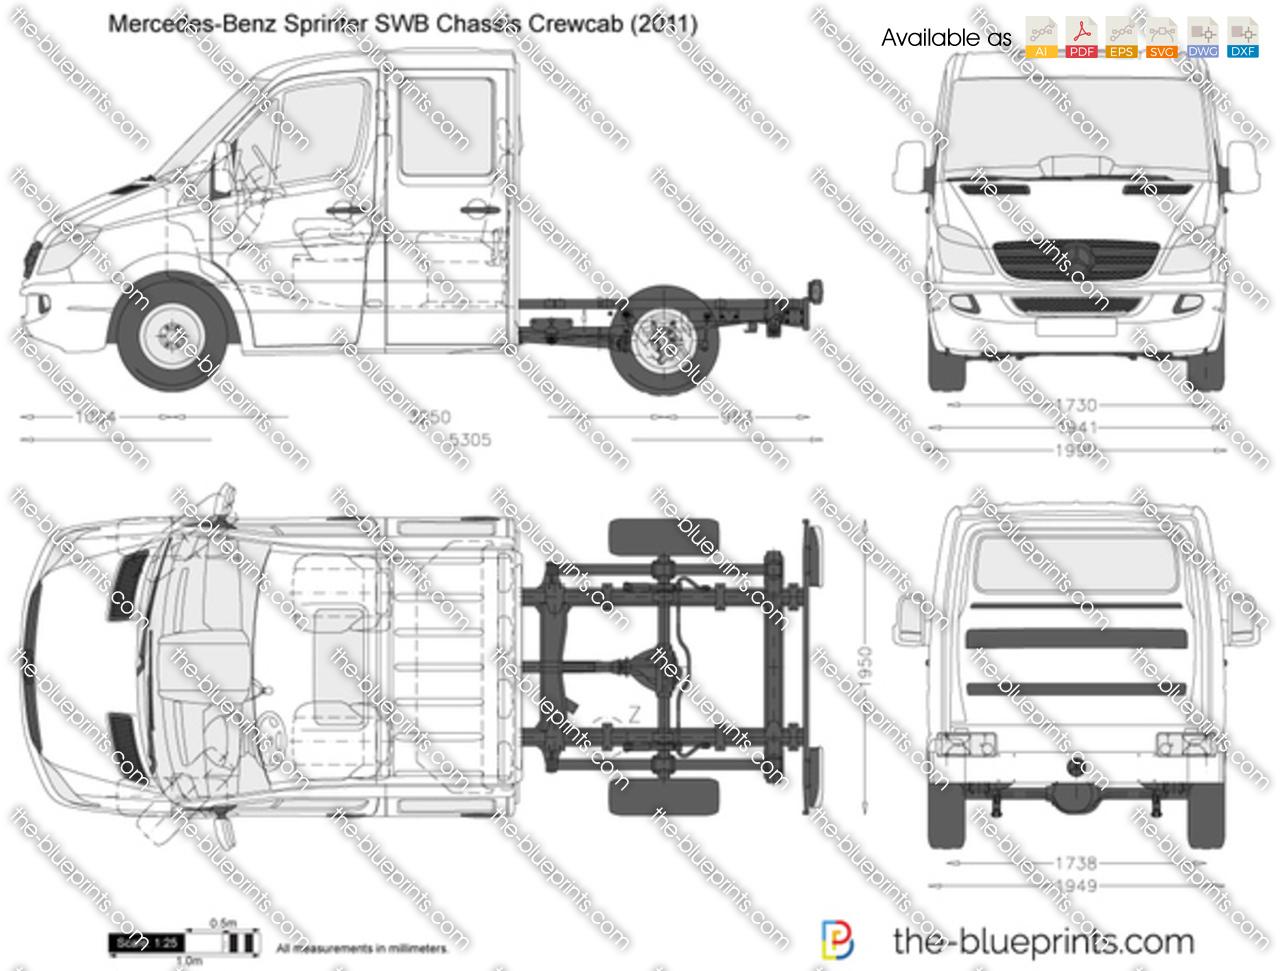 Mercedes-Benz Sprinter SWB Chassis Crewcab